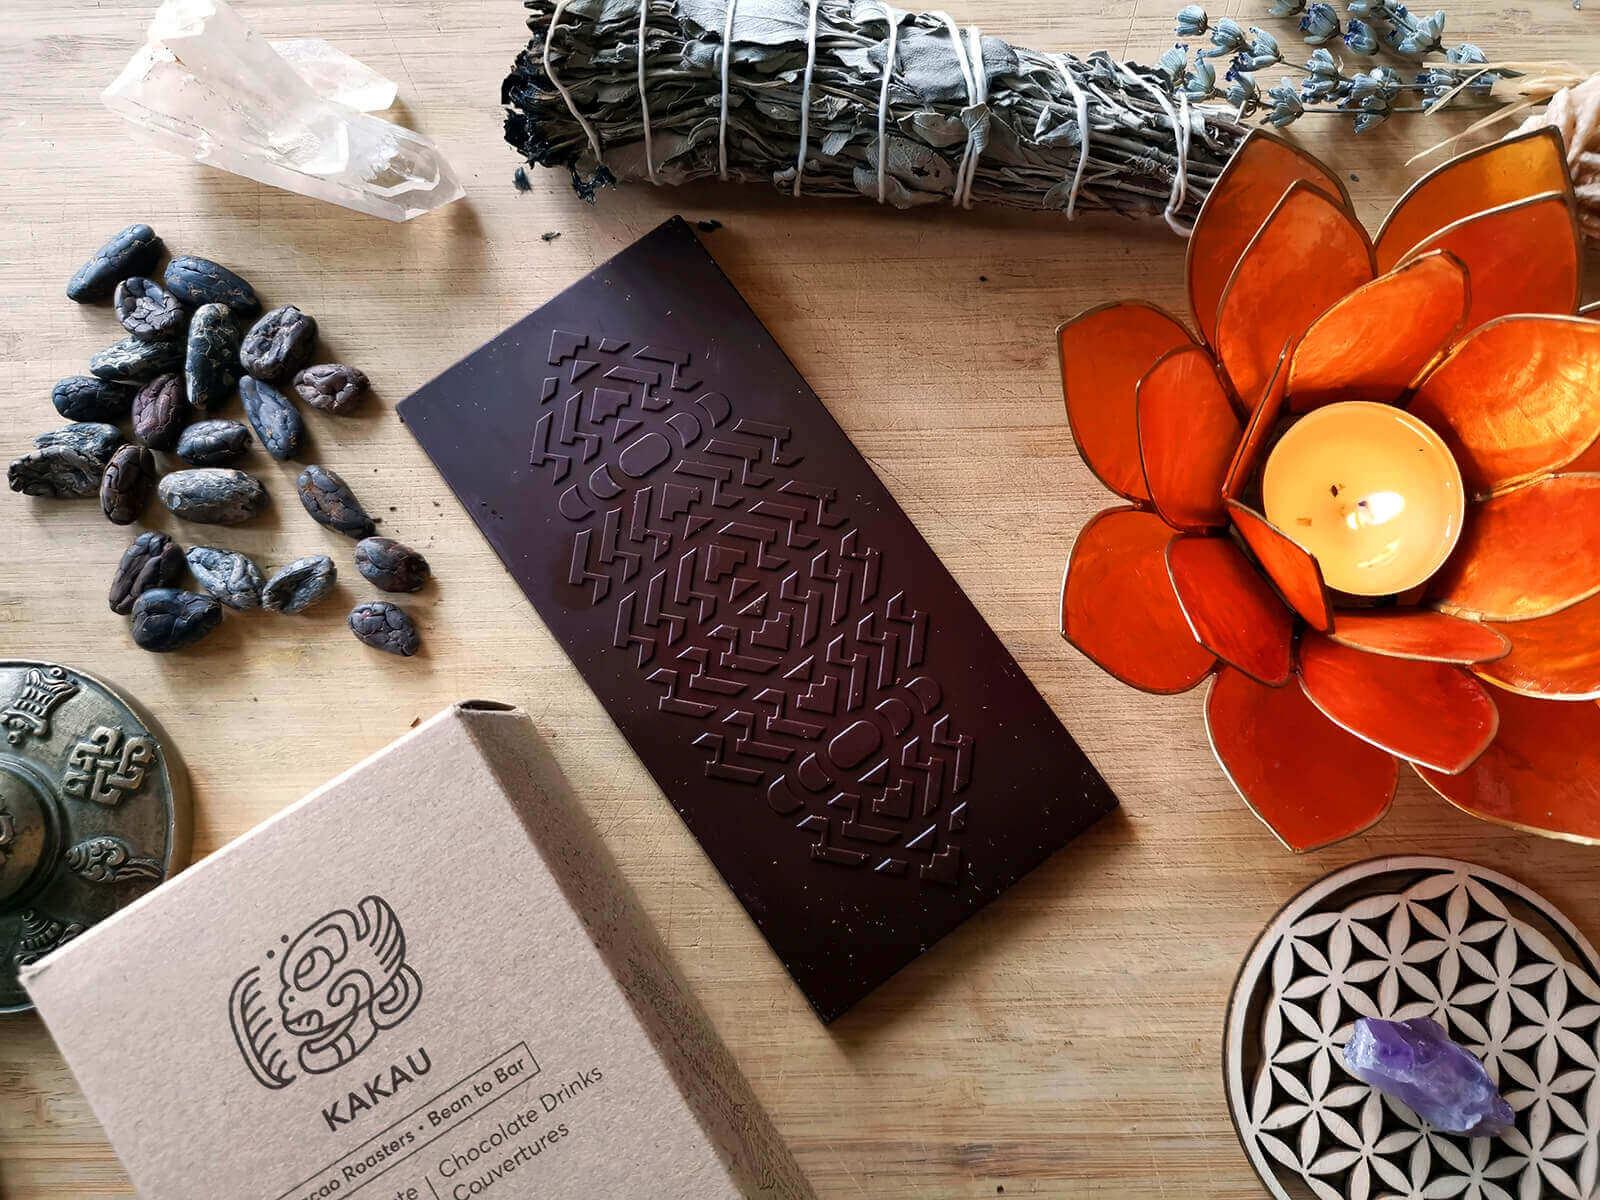 Organikus bio csokoládé